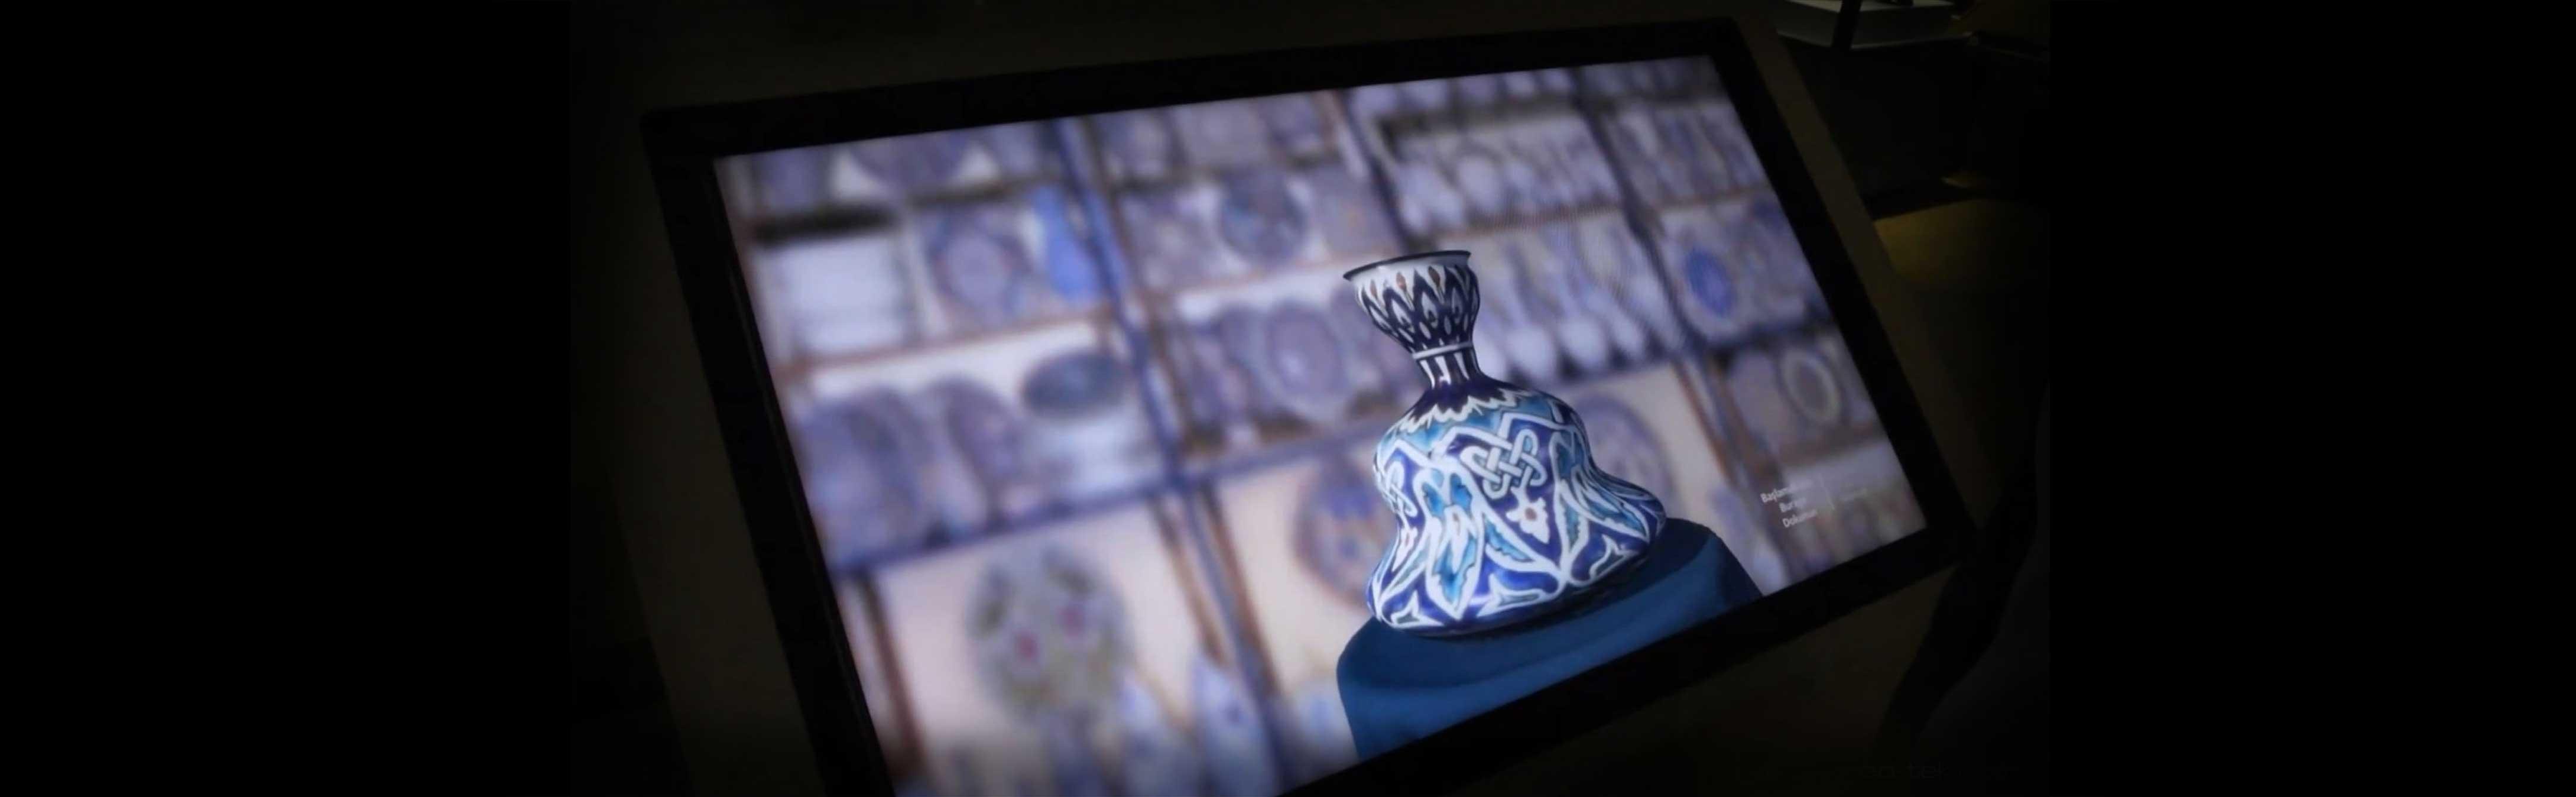 Virtual Ceramic Workshop